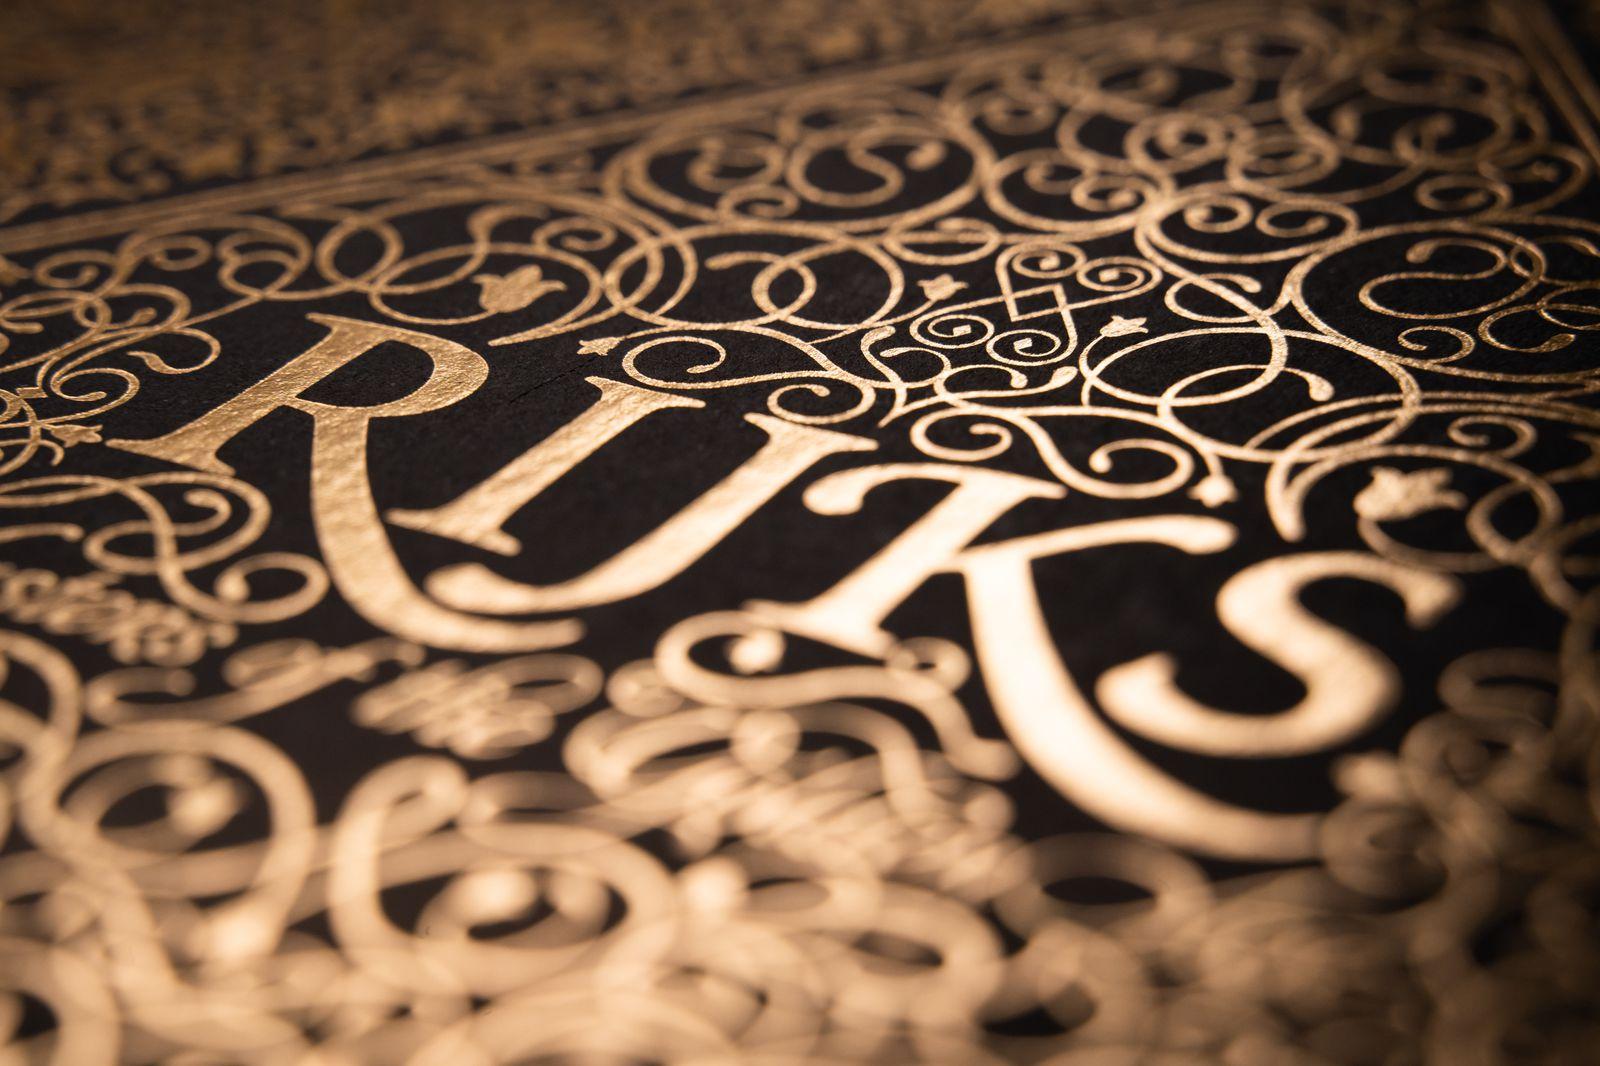 Rijks, Masters of the Golden Age UE - Detail 1.jpg